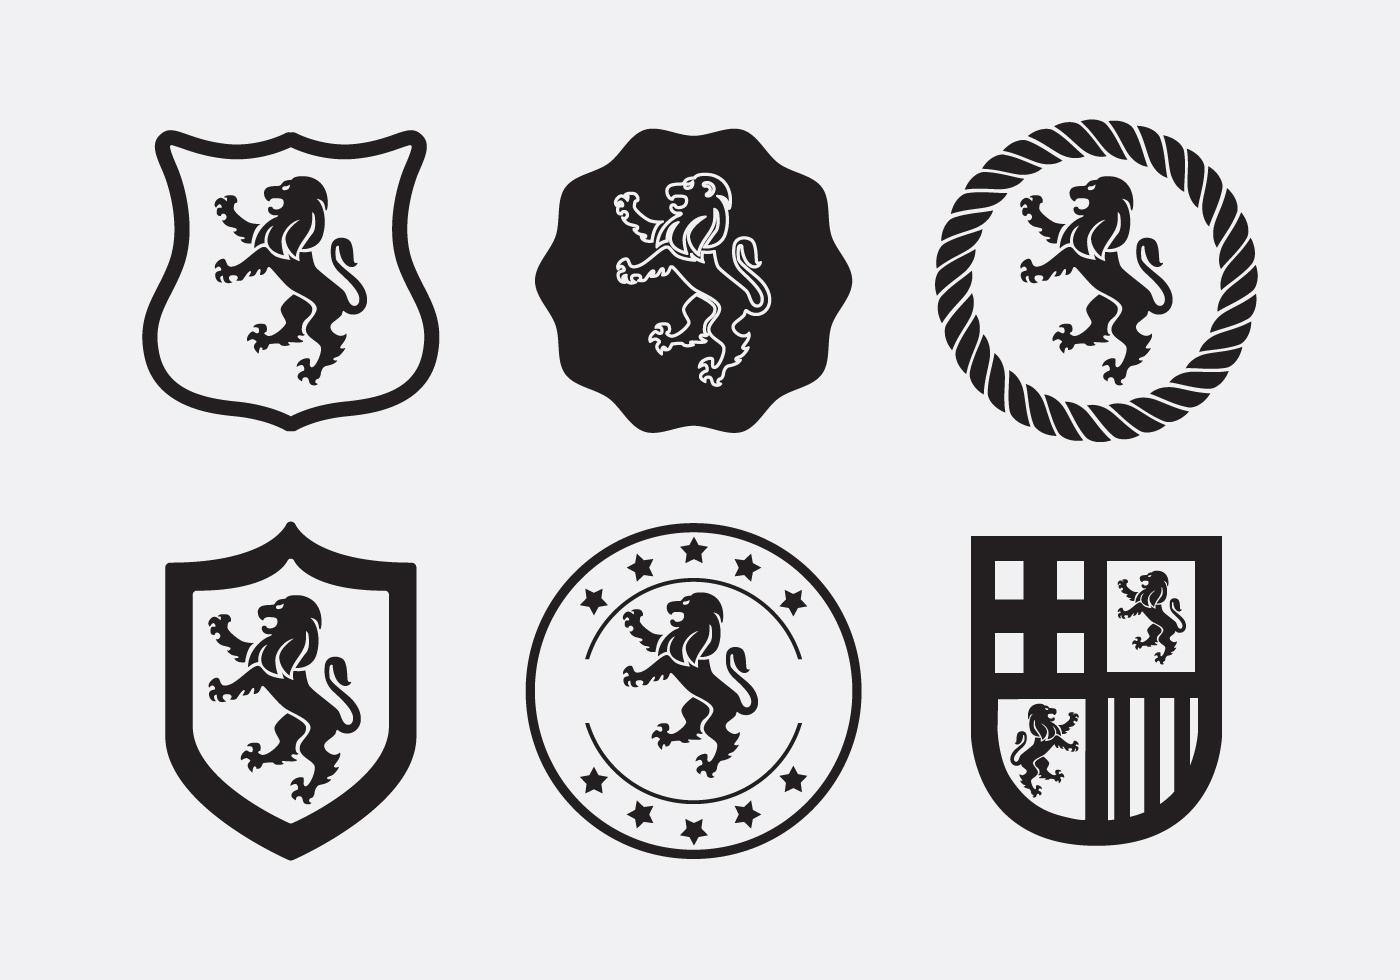 Hogwarts Gryffindor Lions